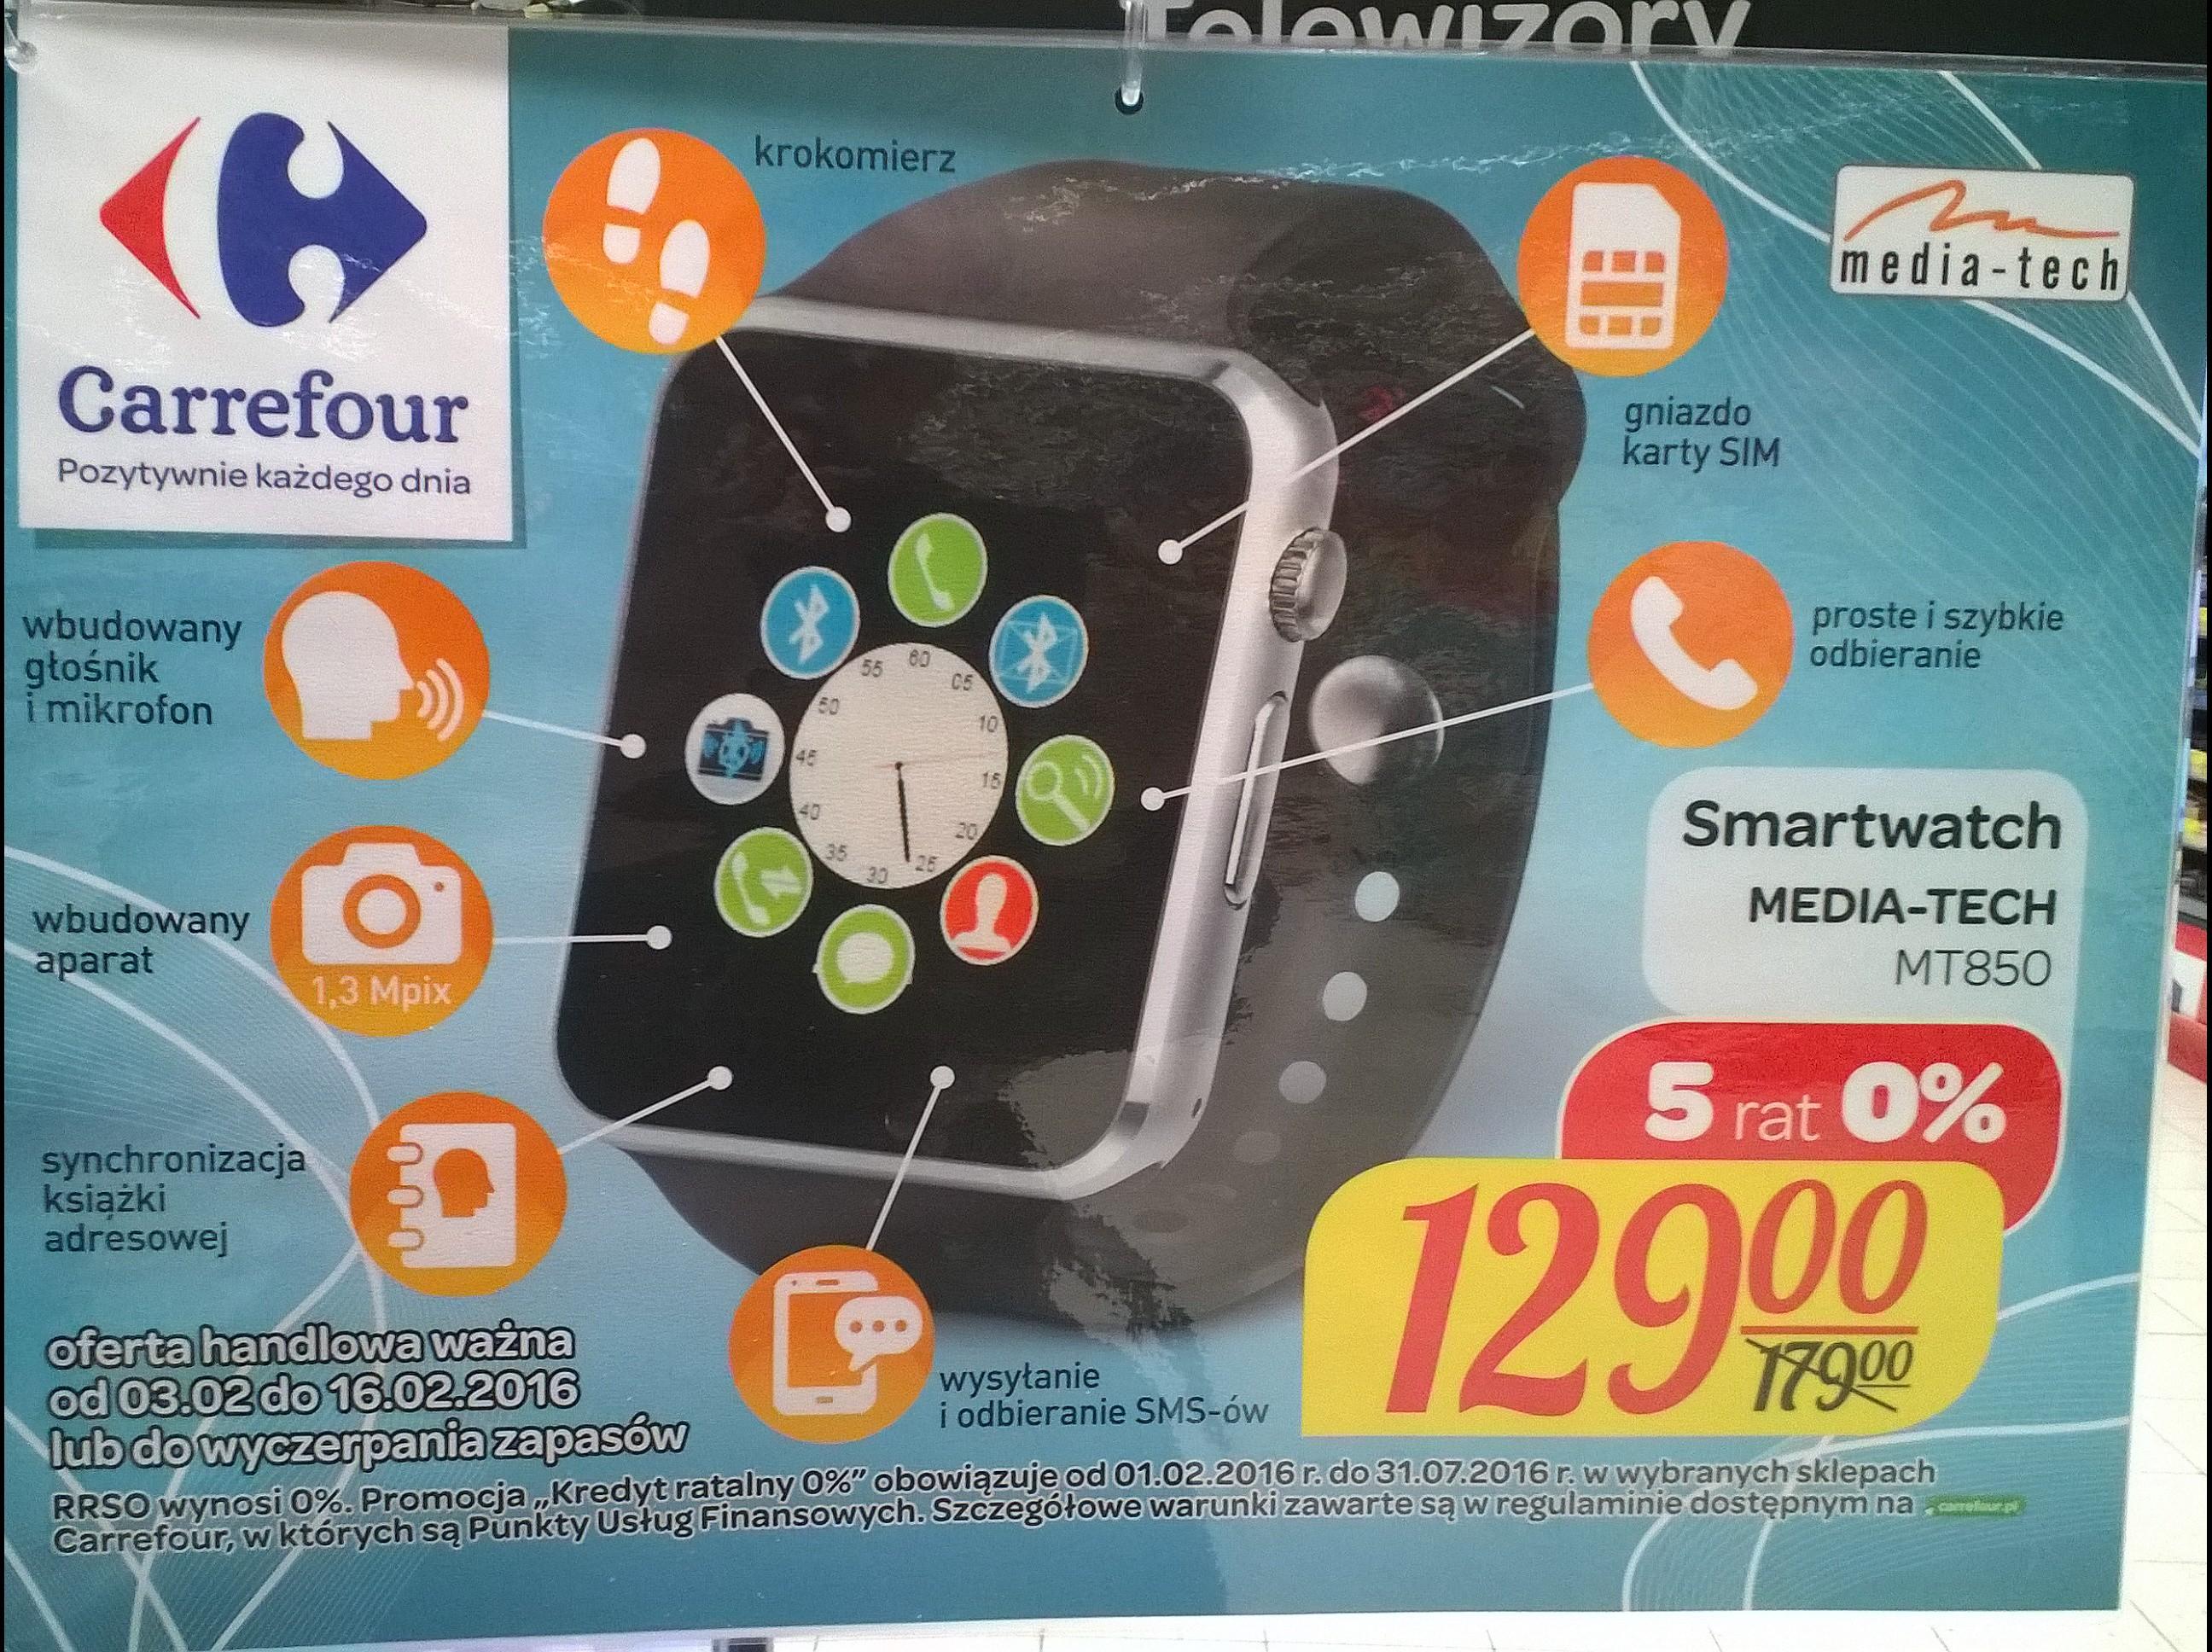 Smartwatch 2G Mediatech MT850 @ Carrefour